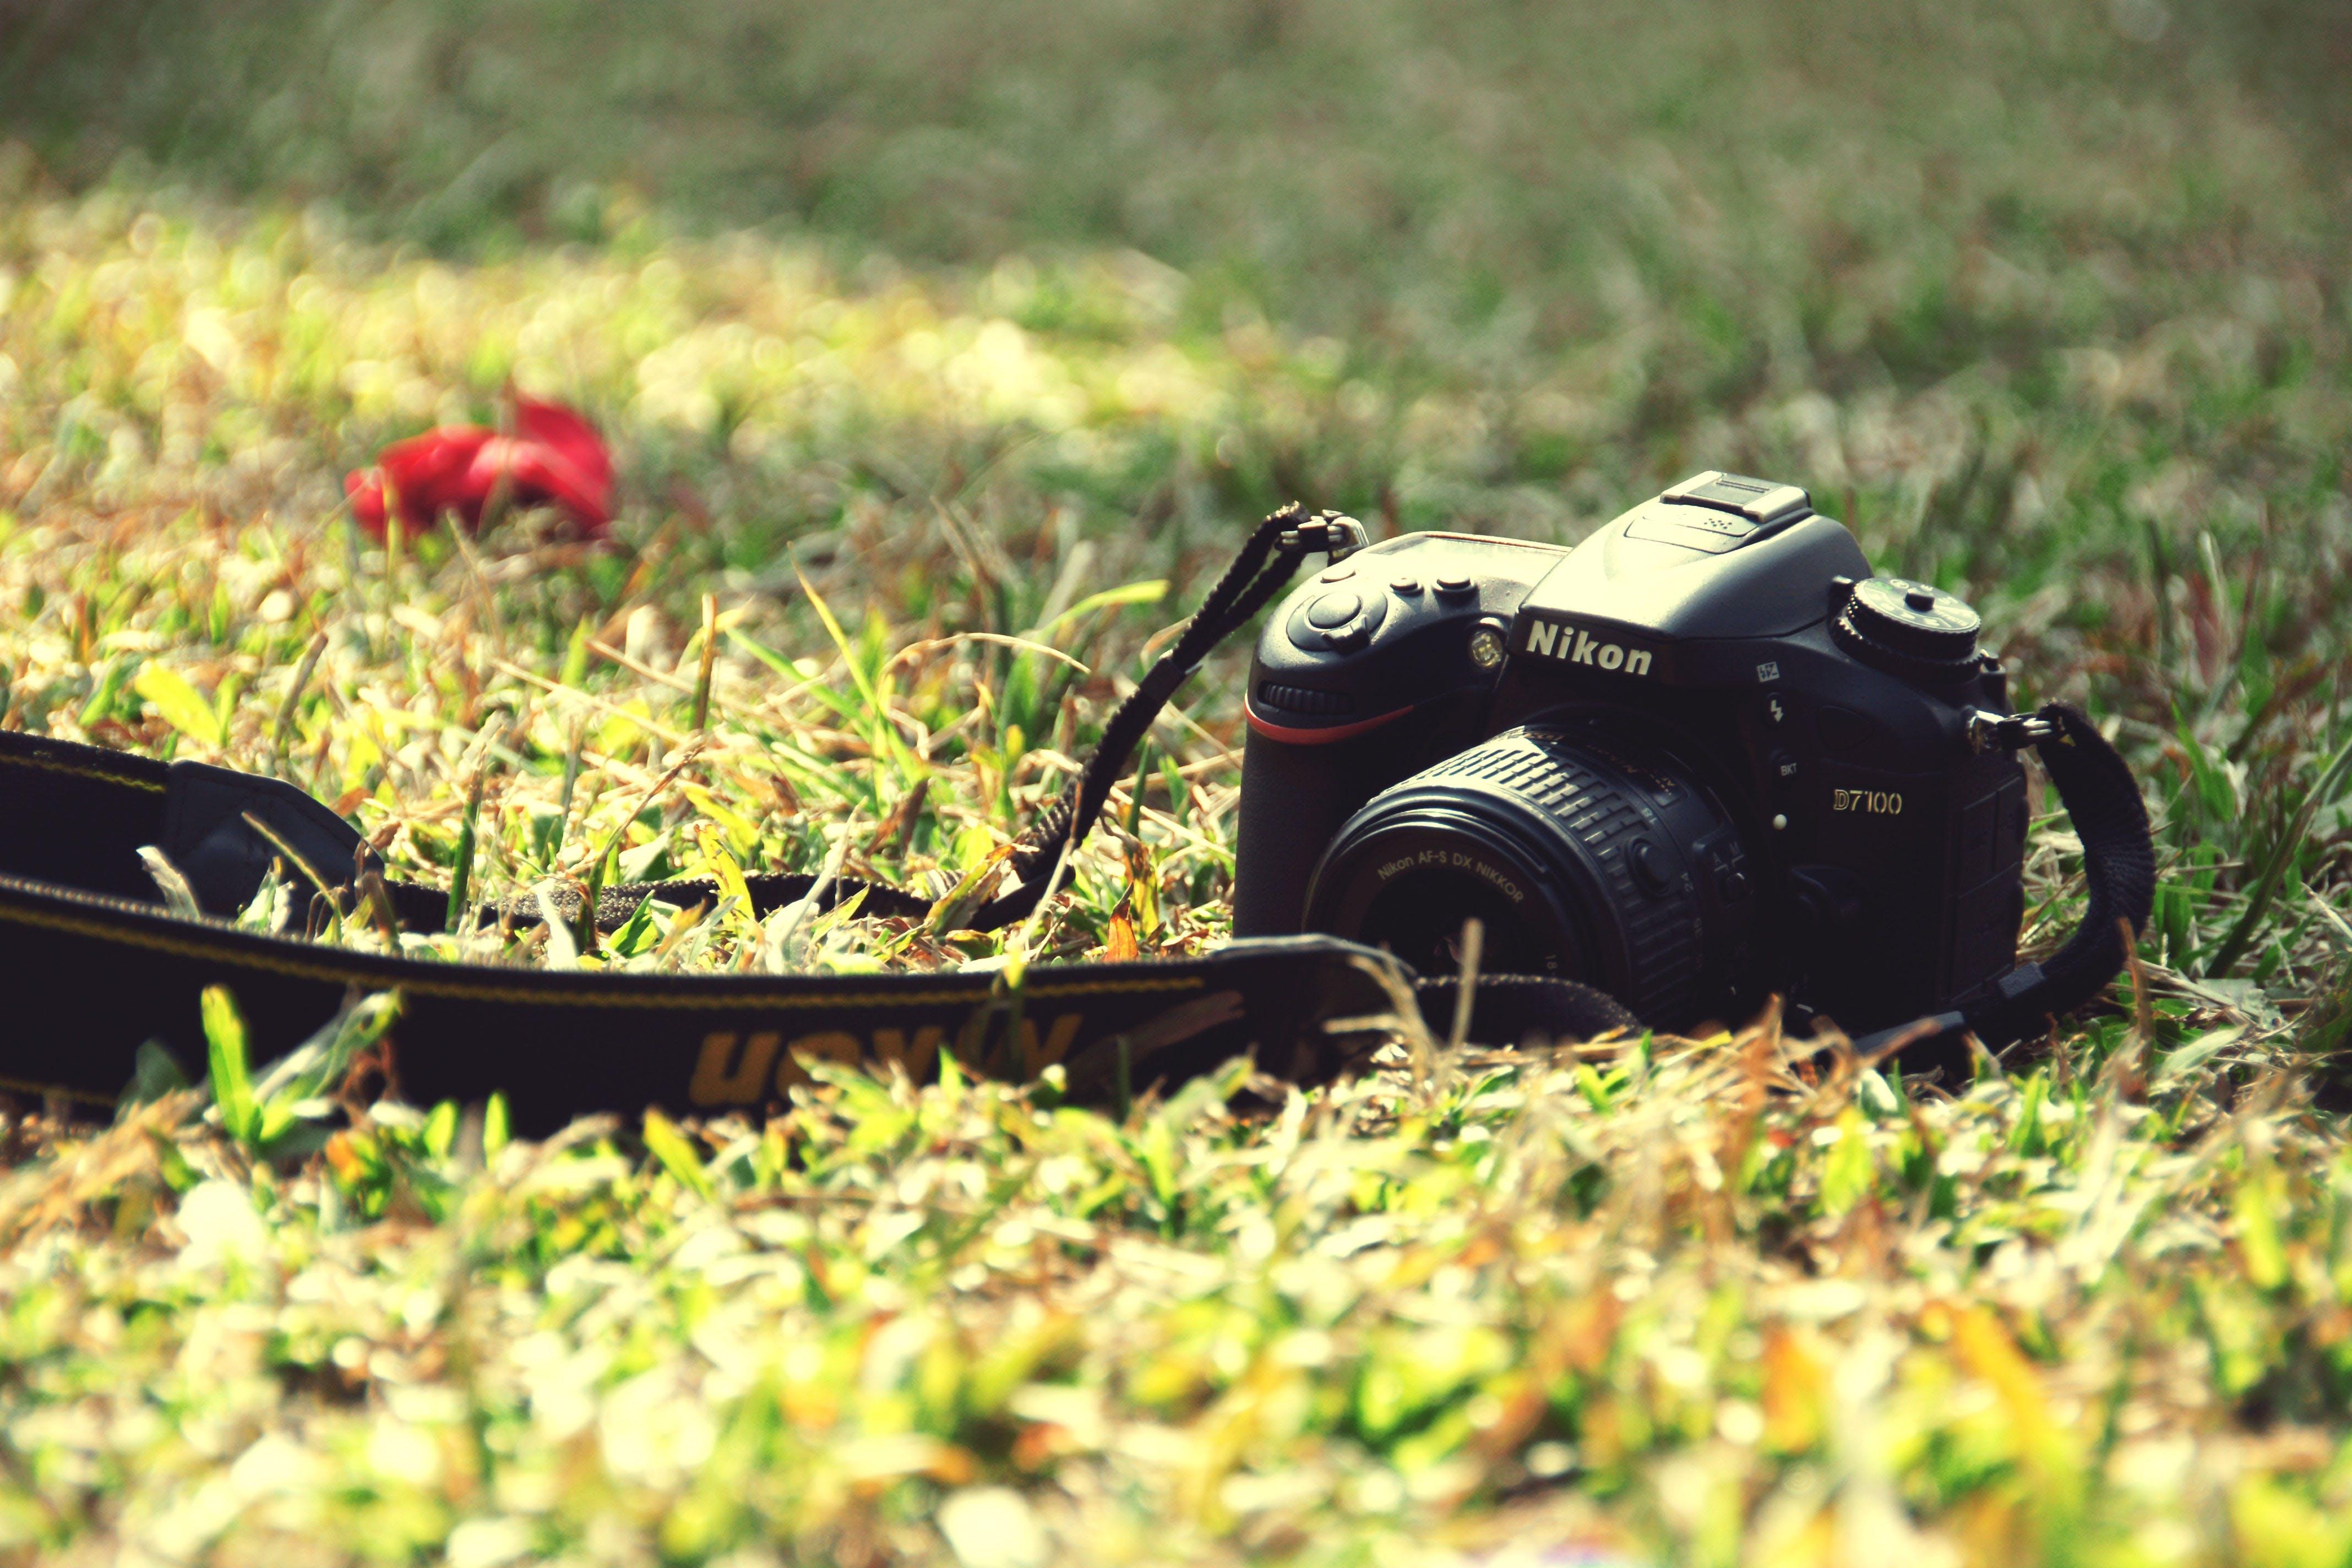 Black Nikon Dslr Camera on Ground